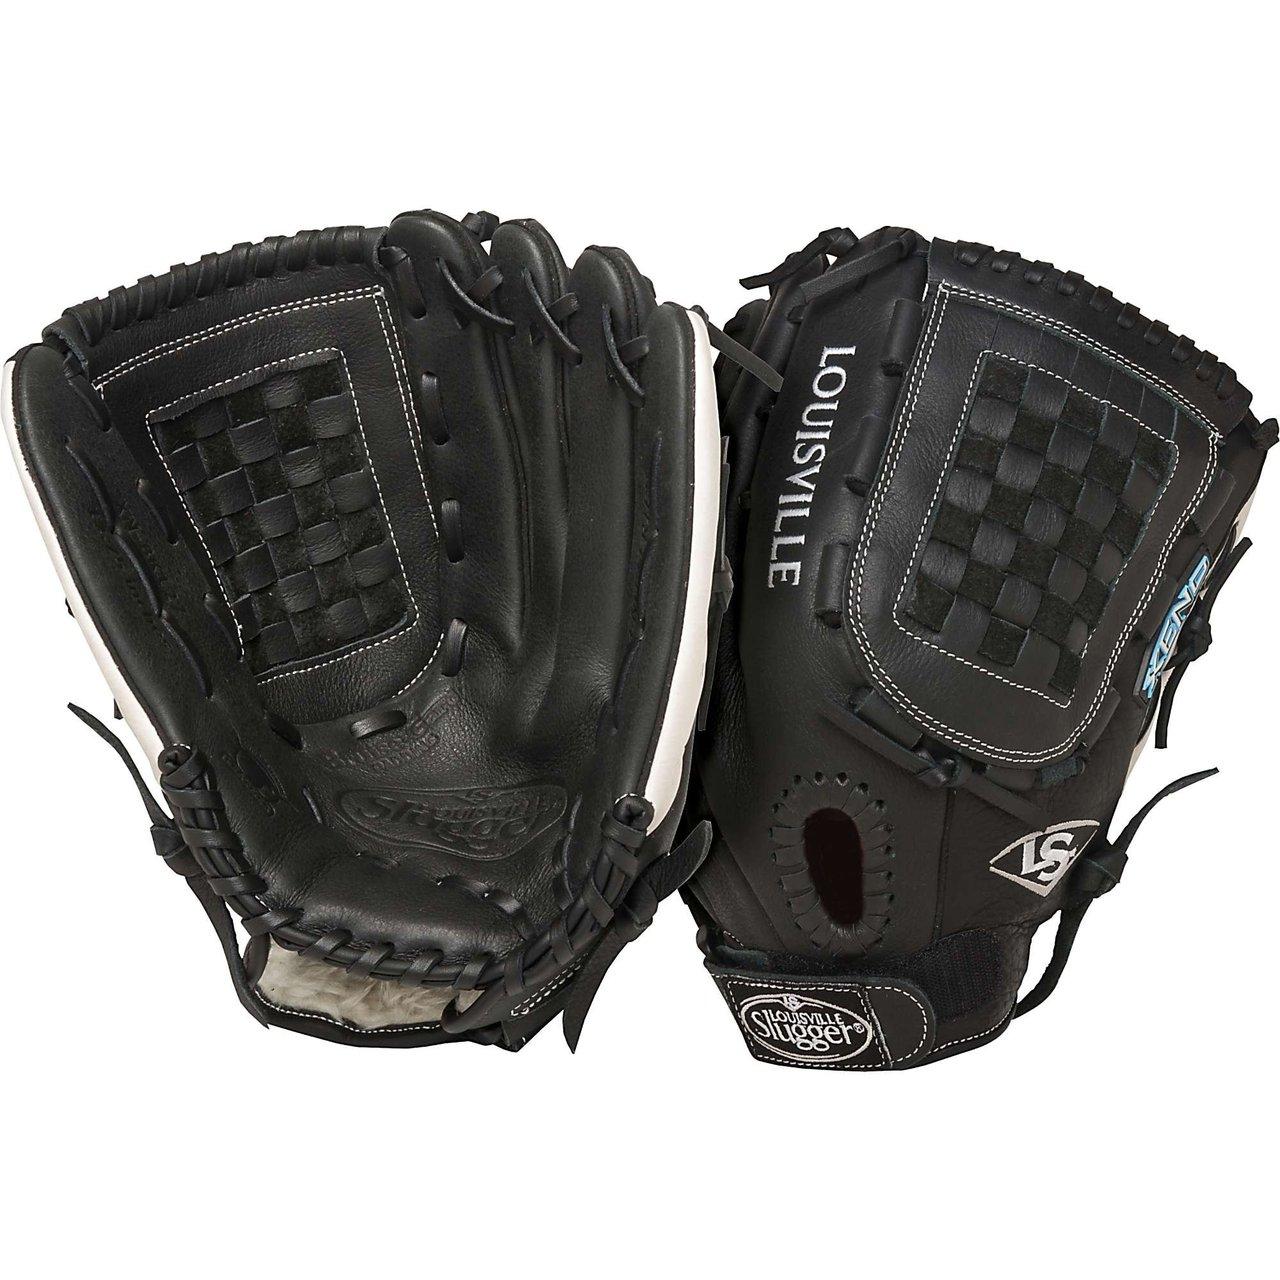 louisville-slugger-fgxn14-bk127-xeno-black-12-75-fastpitch-softball-glove-right-handed-throw FPXN14-BK127-Right Handed Throw Louisville 044277007928 The Louisville Slugger Xeno Fastpitch series softball glove takes best-in-class premium